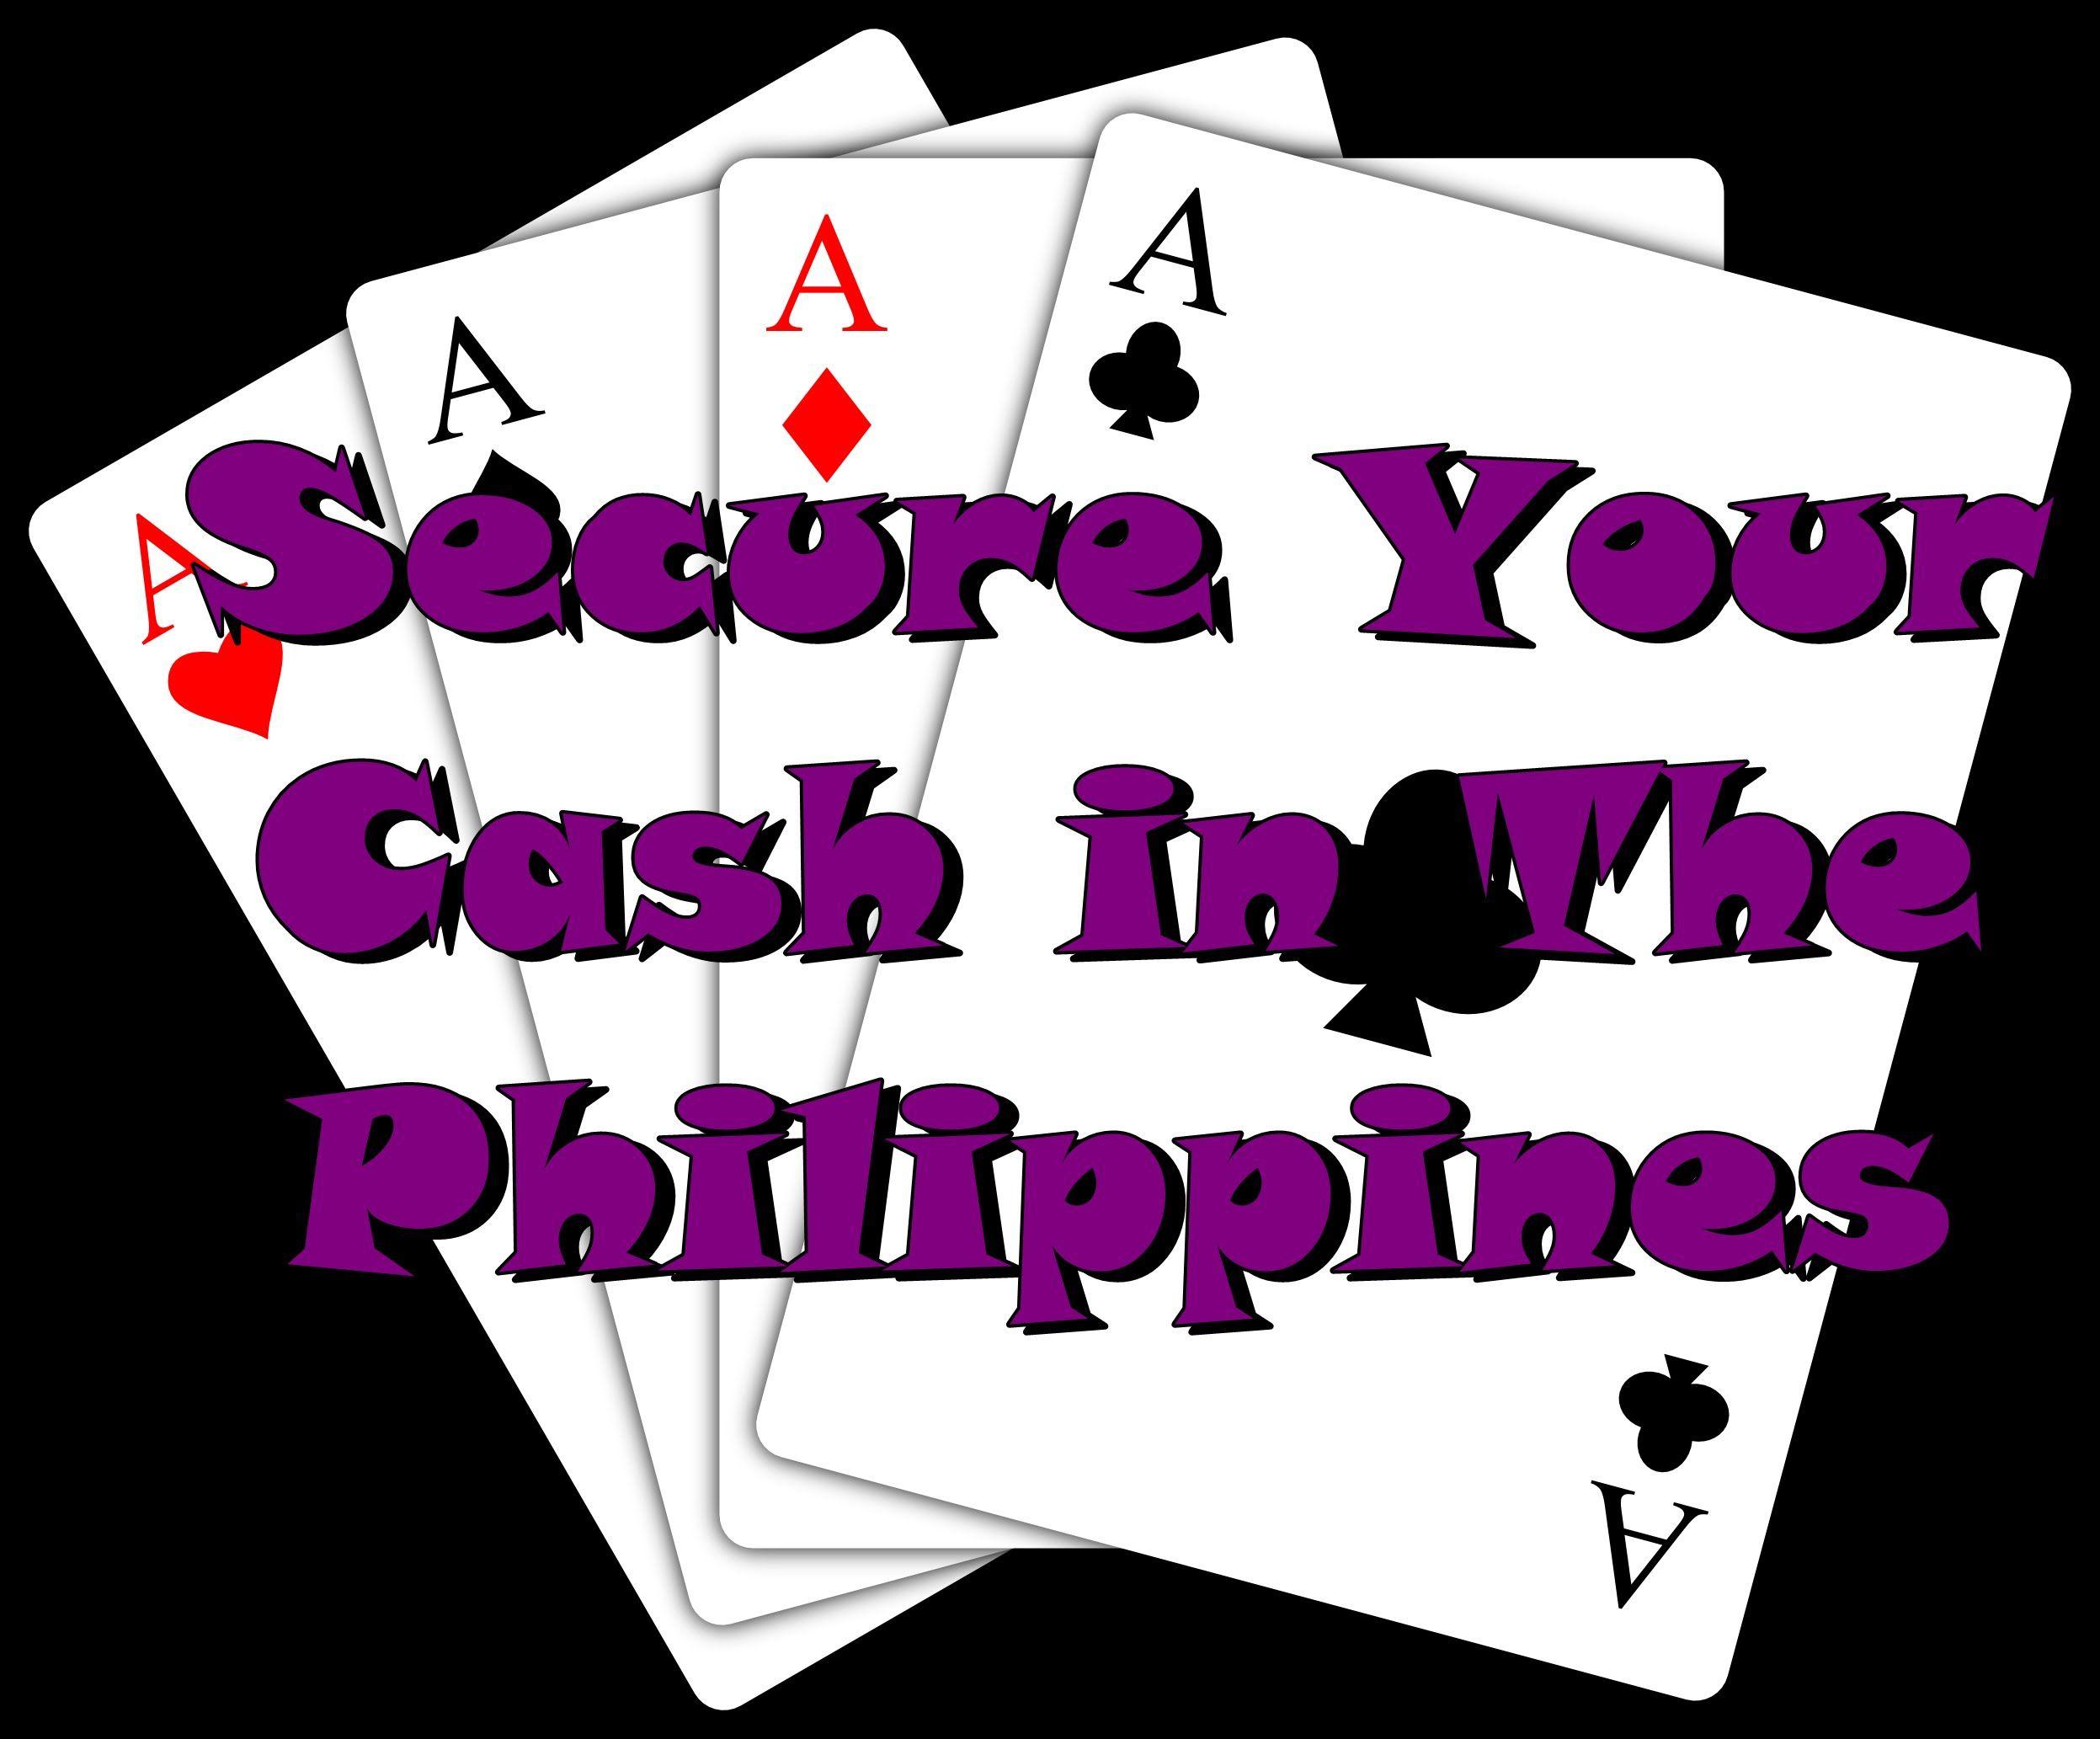 Secure Your Cash Philippines  #secure #safe #cash #philippines